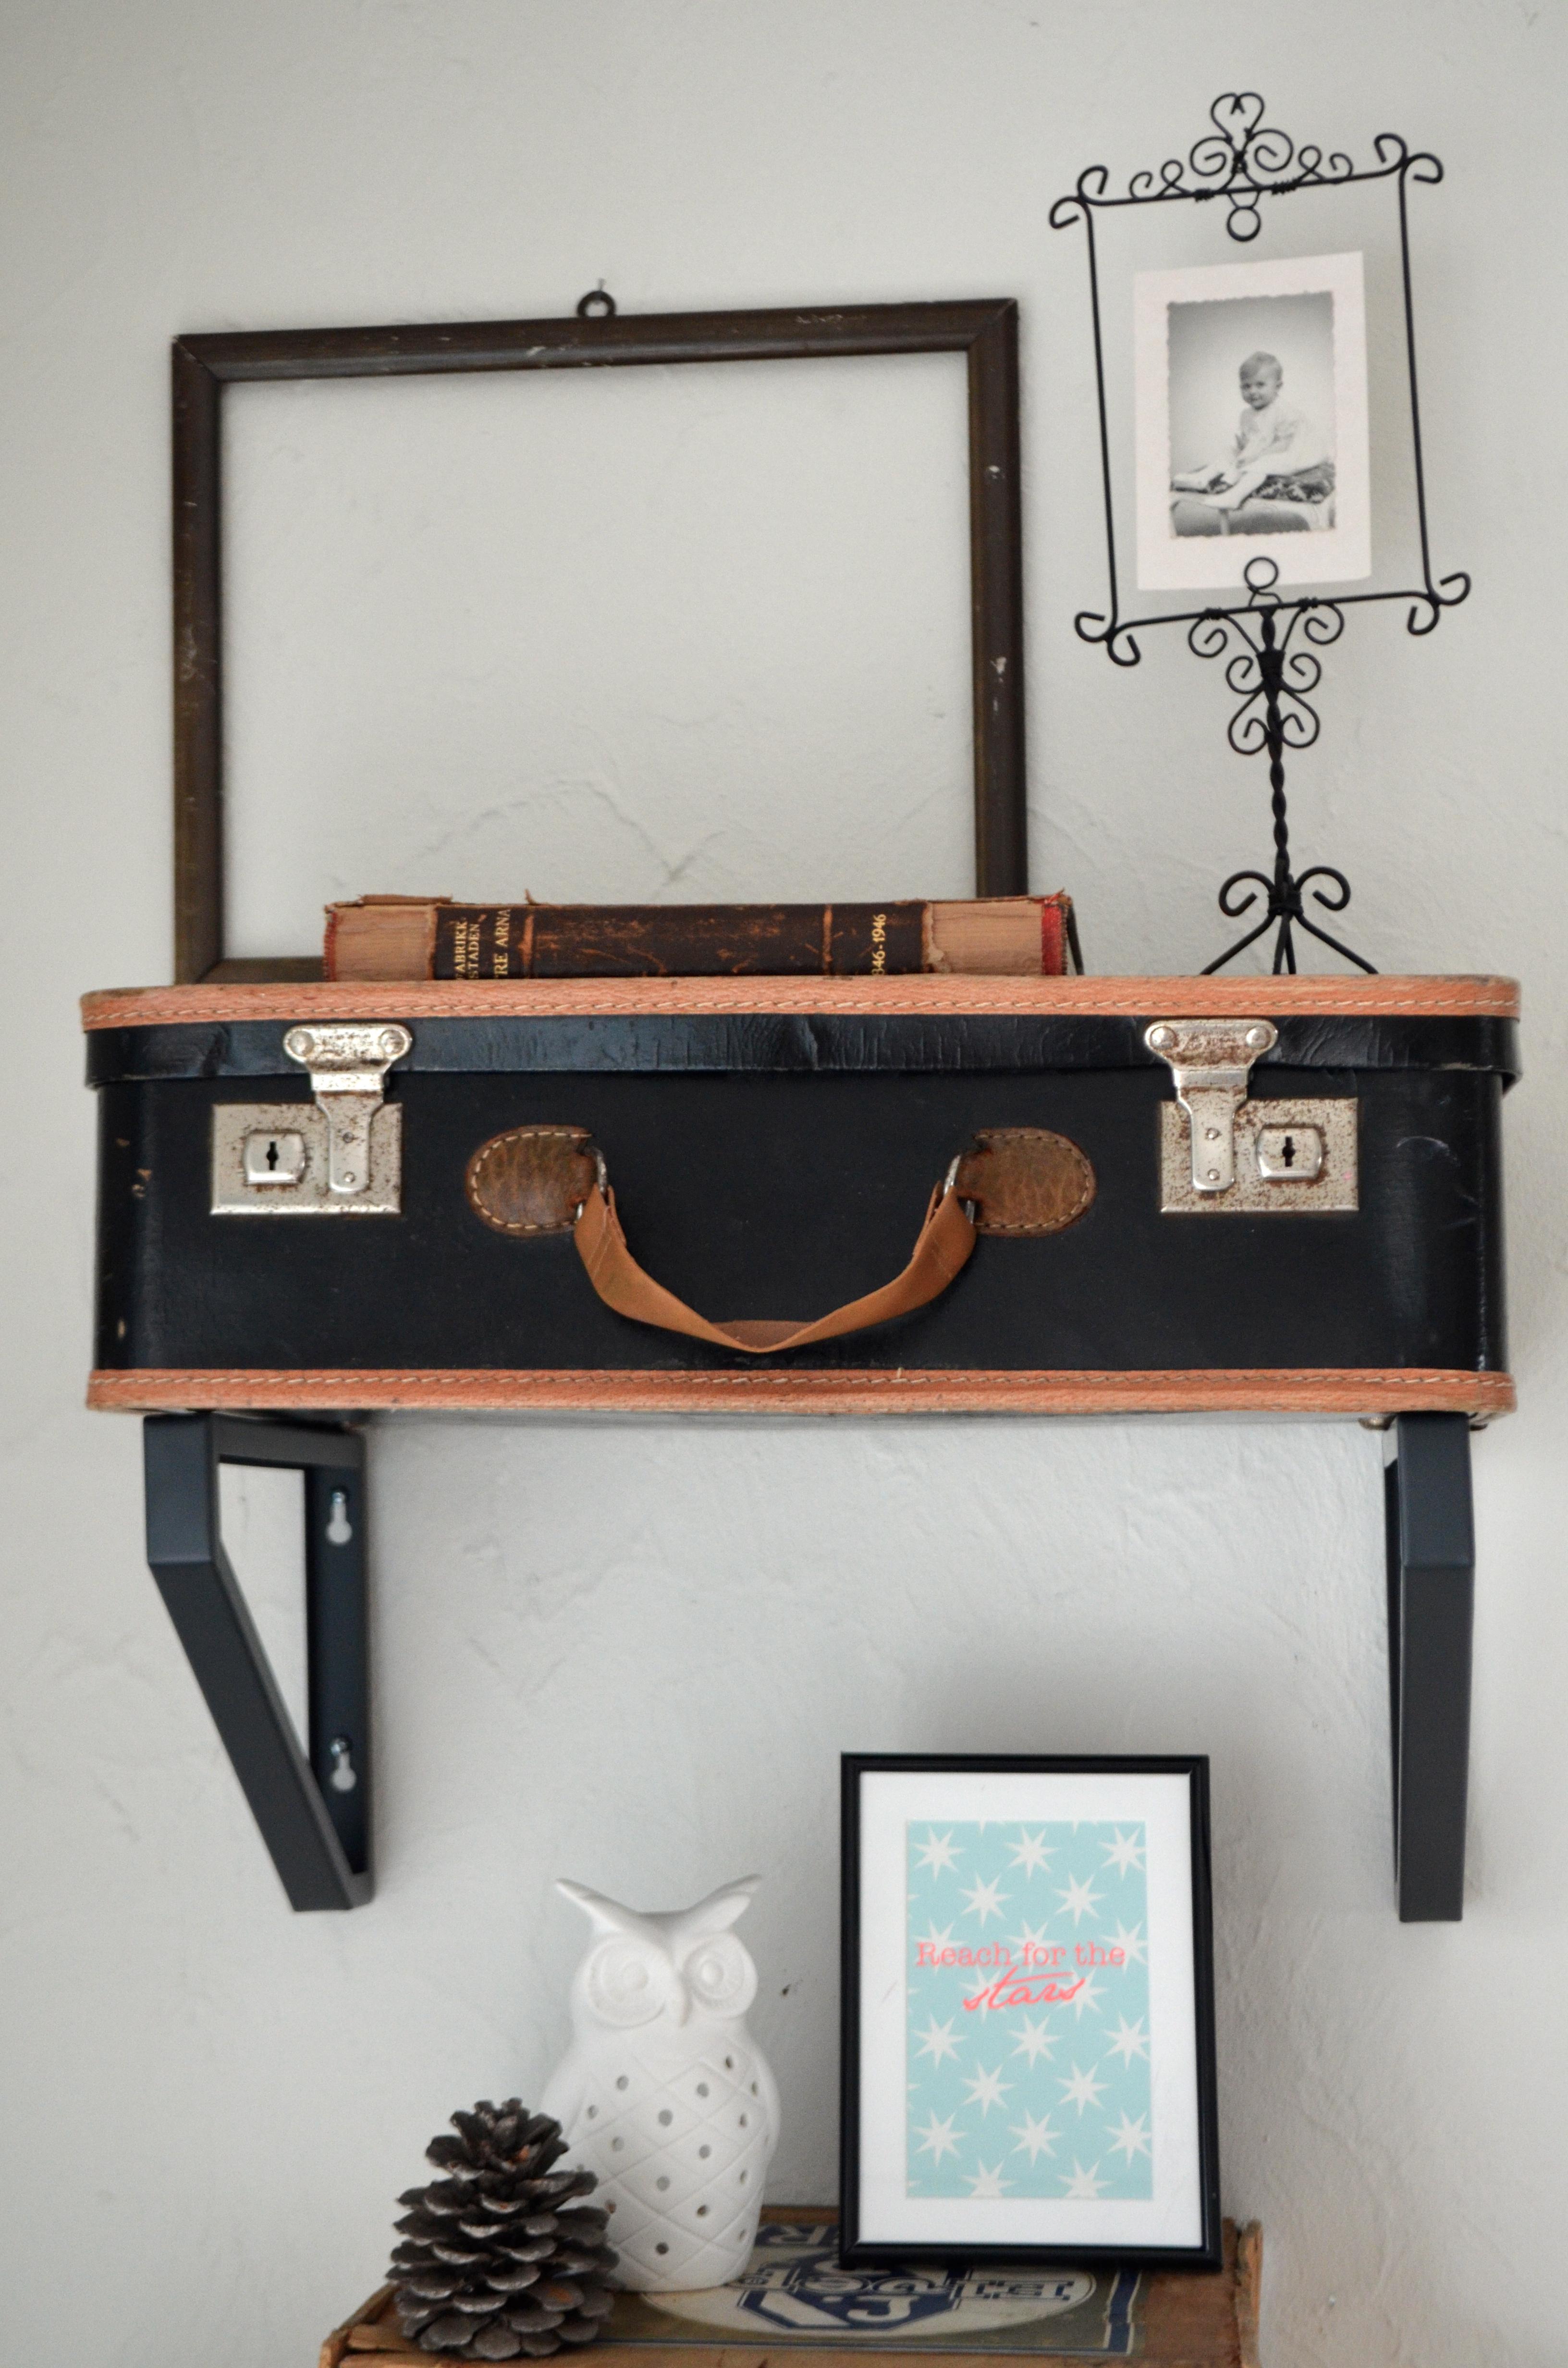 tagikea ideen kreativ wohndesign und m bel ideen. Black Bedroom Furniture Sets. Home Design Ideas